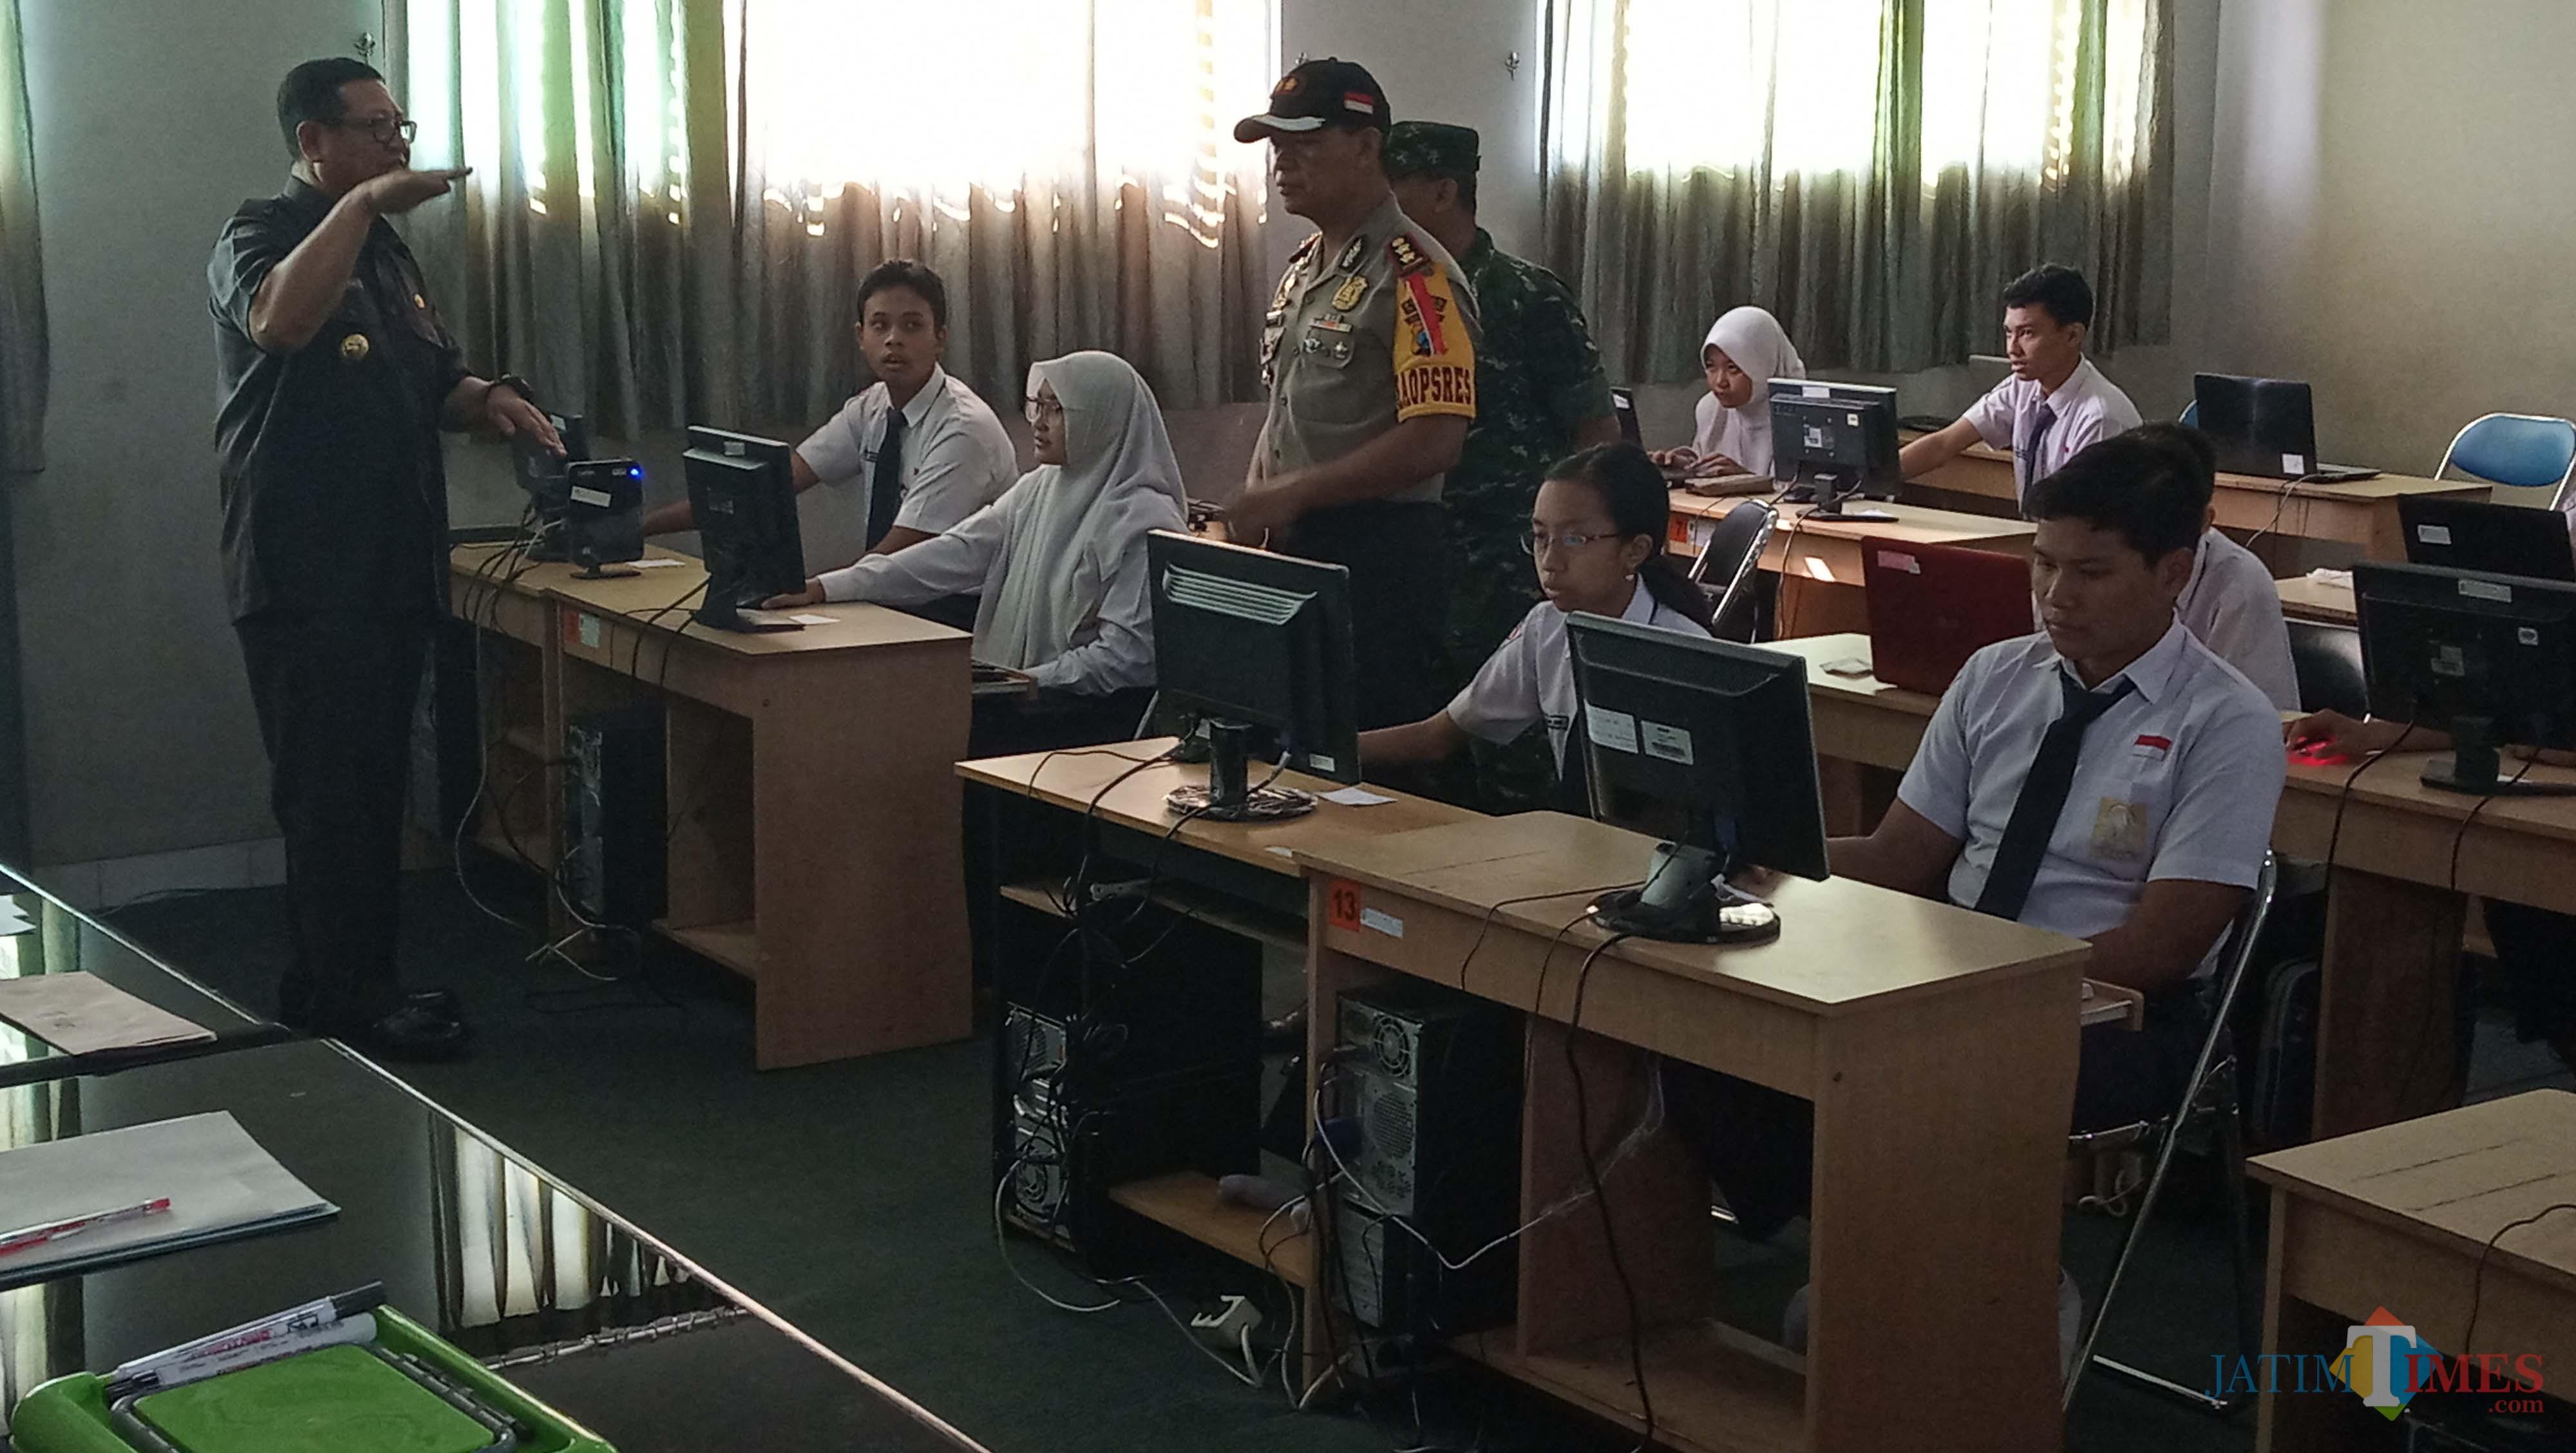 Plt Bupati Tulungagung, Maryoto Birowo (baju hitam) saat memantau pelaksanaan UNBK dengan didampingi Forkopimda (foto : Joko Pramono/Tulungagungtimes)